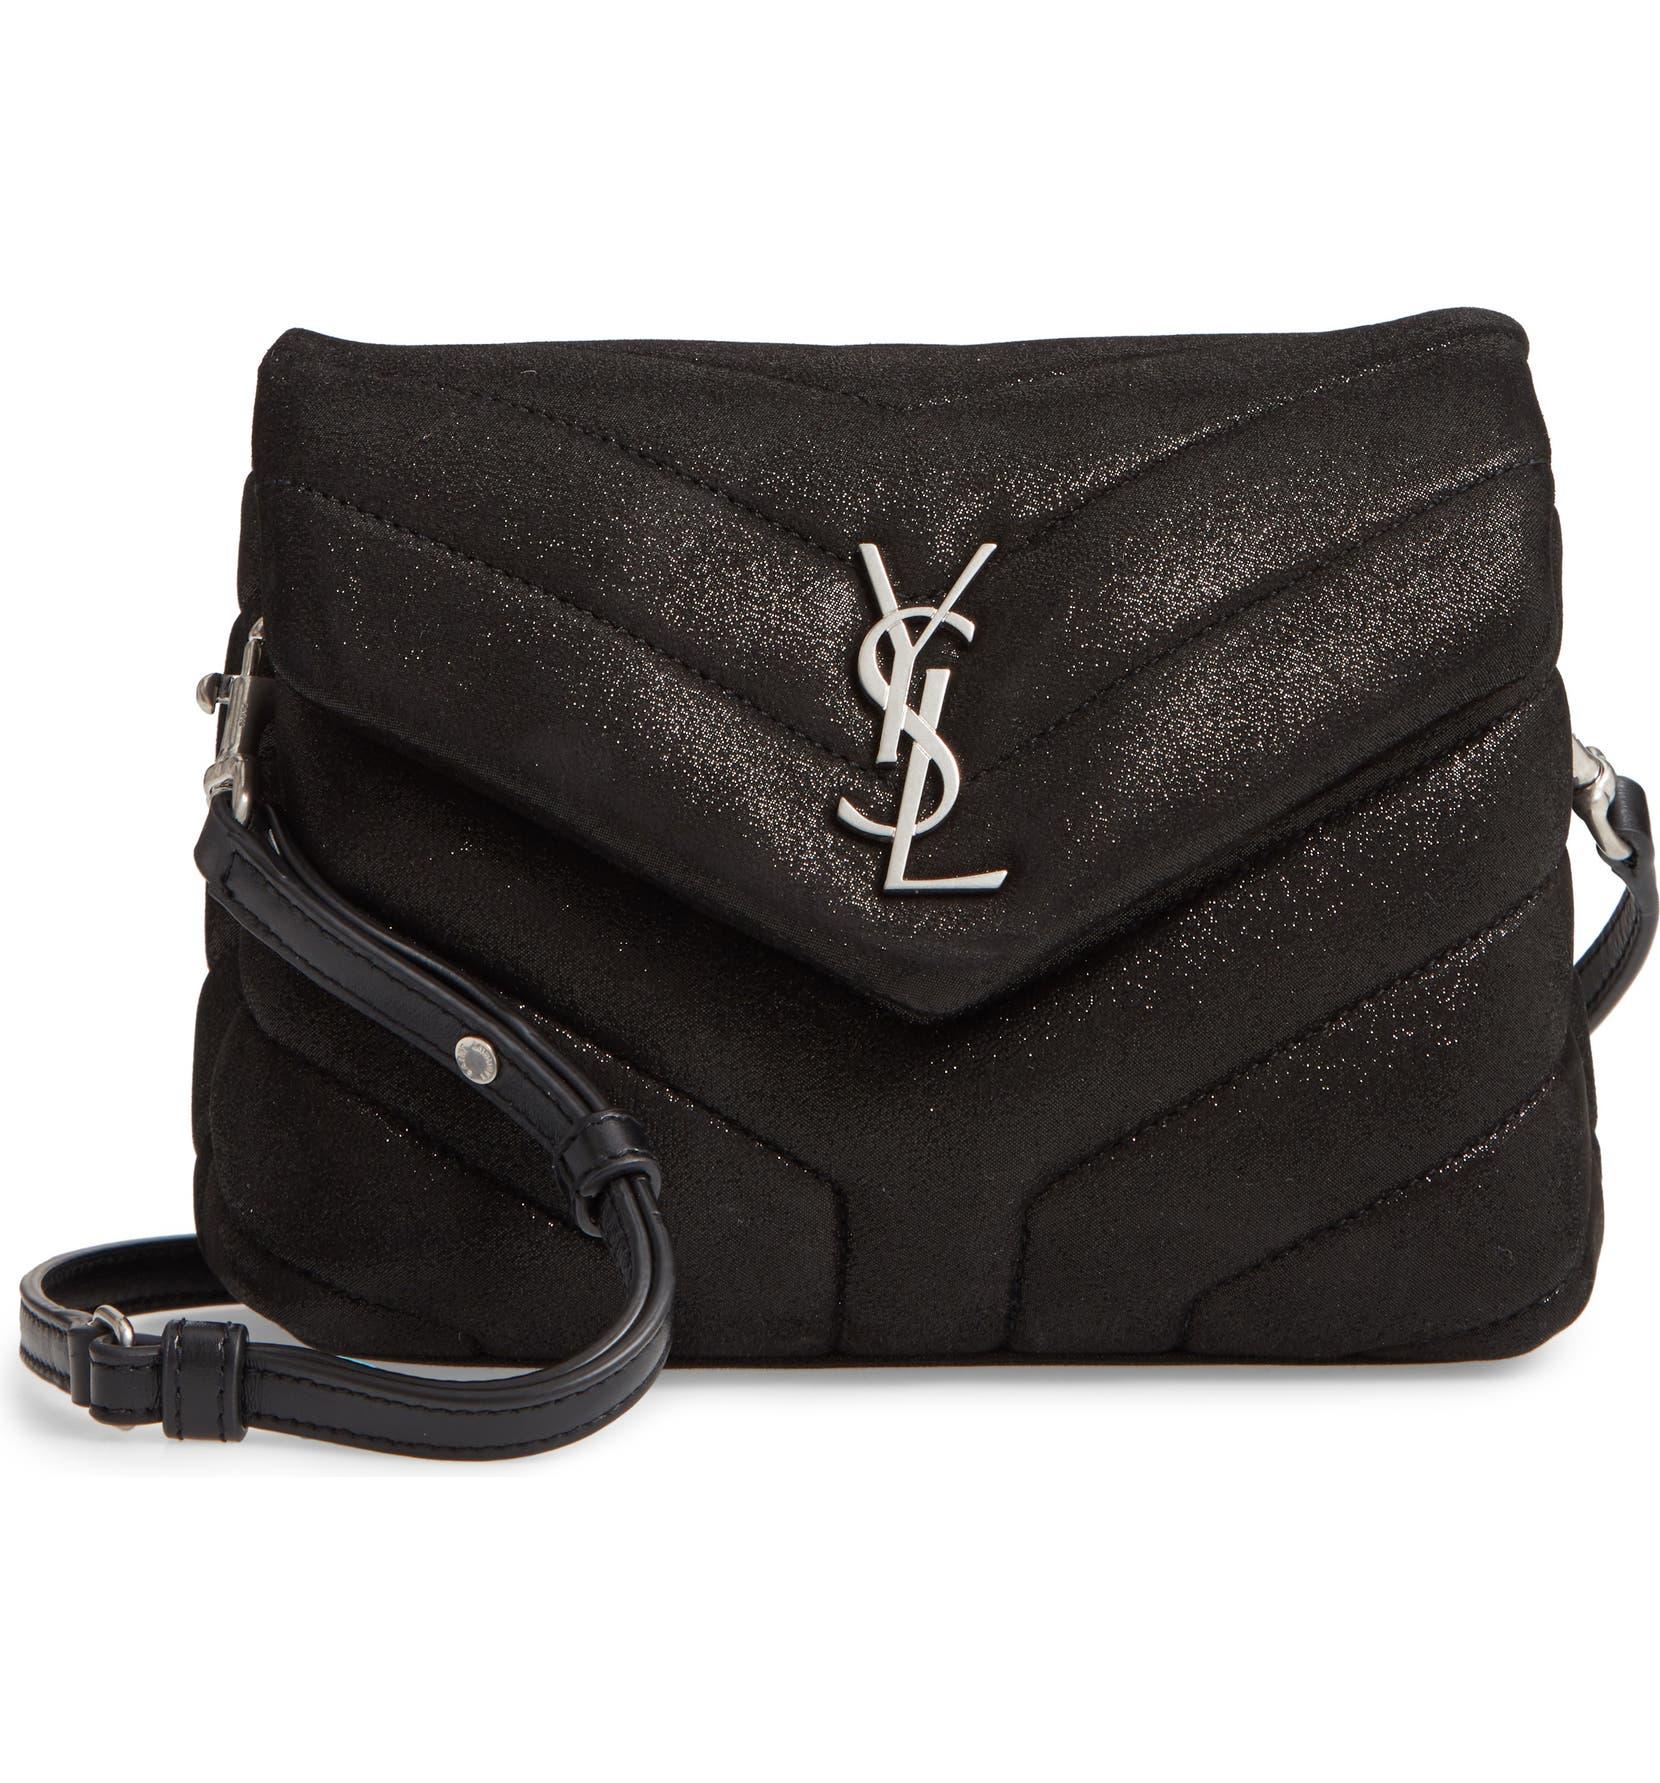 75a6b89588 Saint Laurent Mini Loulou Glitter Suede Crossbody Bag